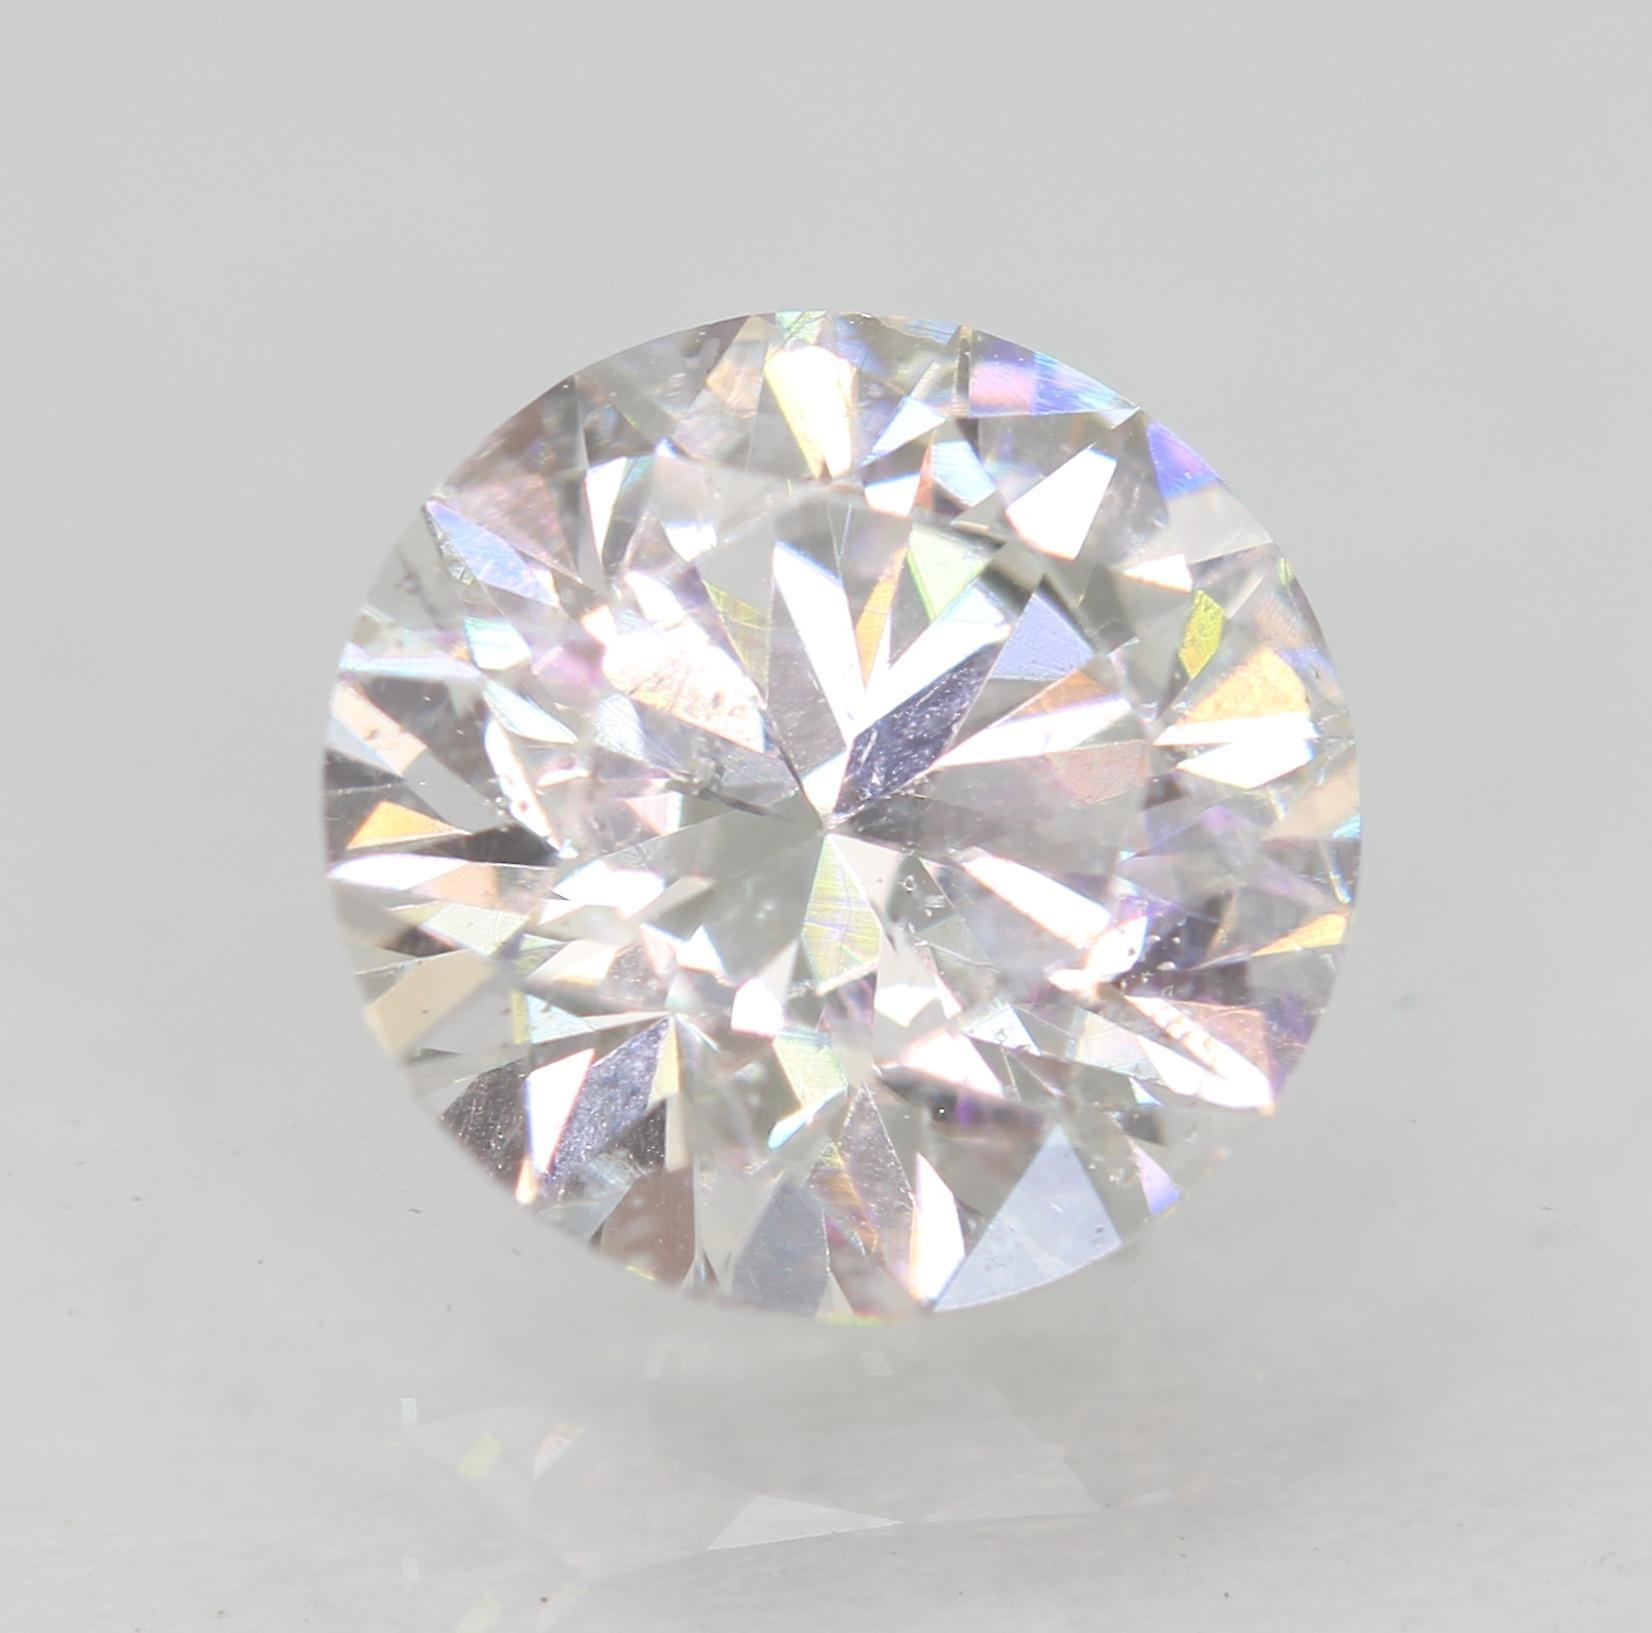 Certified 1.07 Carat E VS2 Round Brilliant Enhanced Natural Loose Diamond 6.62mm